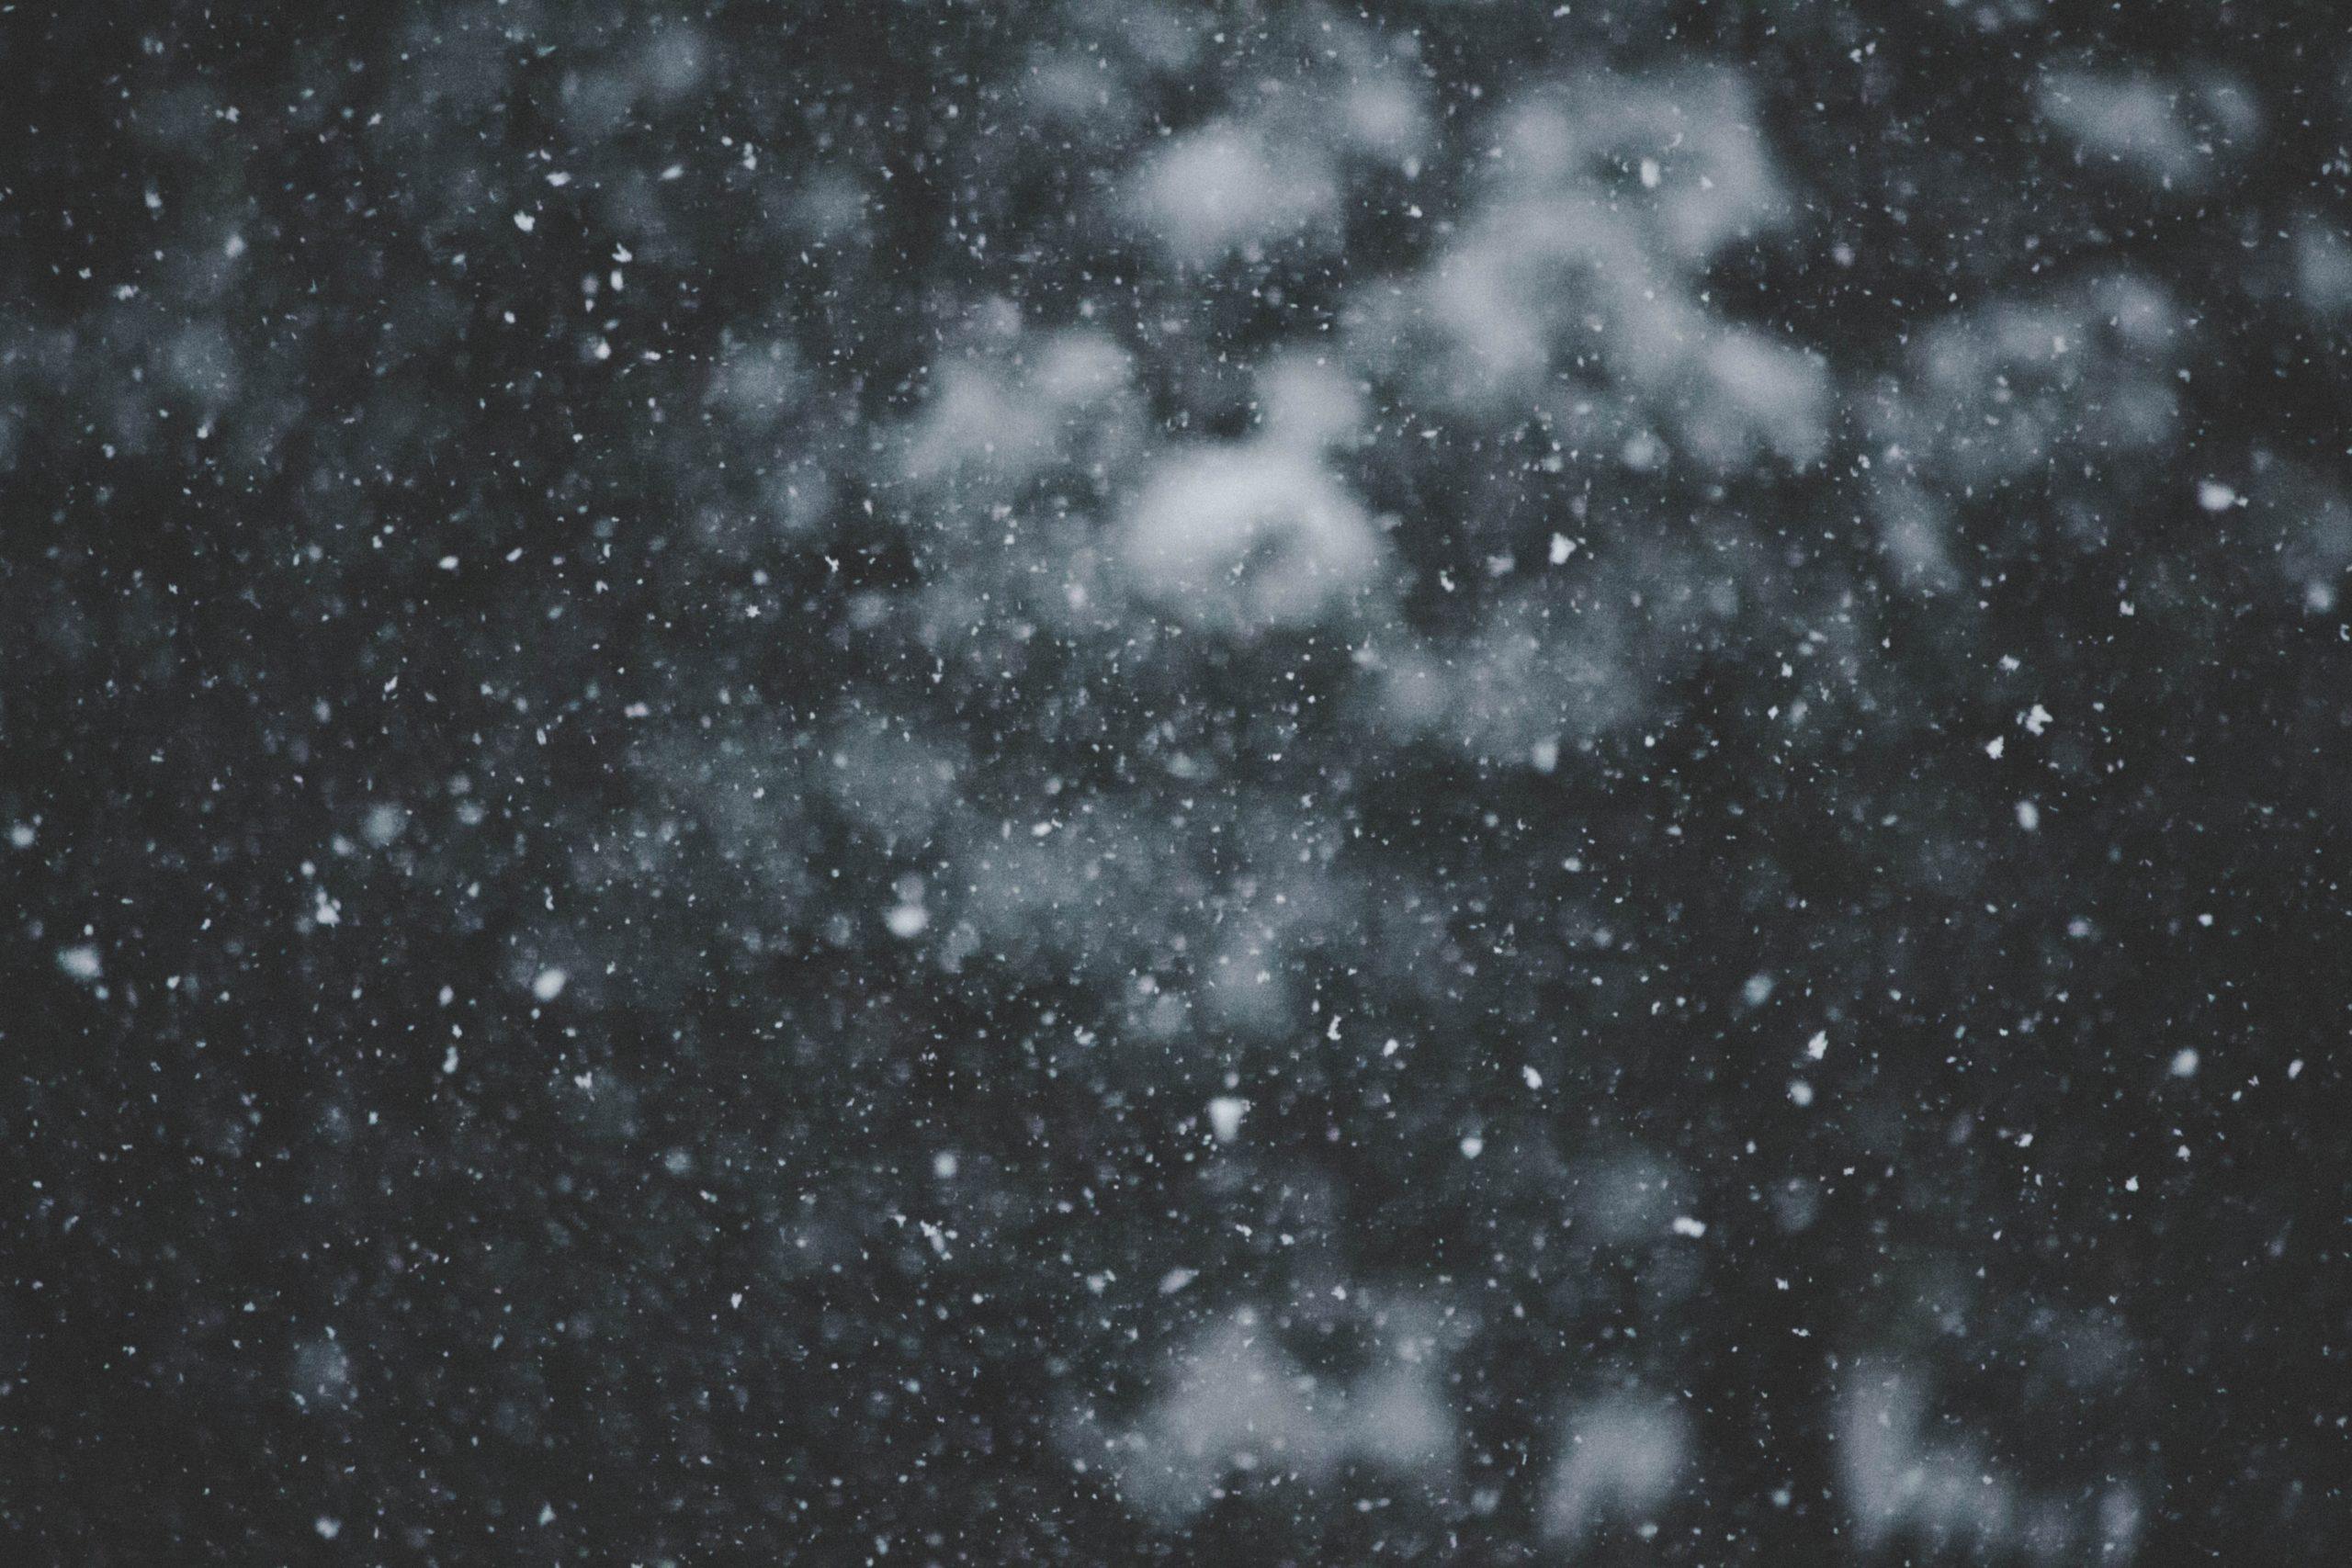 insomnia snow不眠の雪 - a Tanka Poem